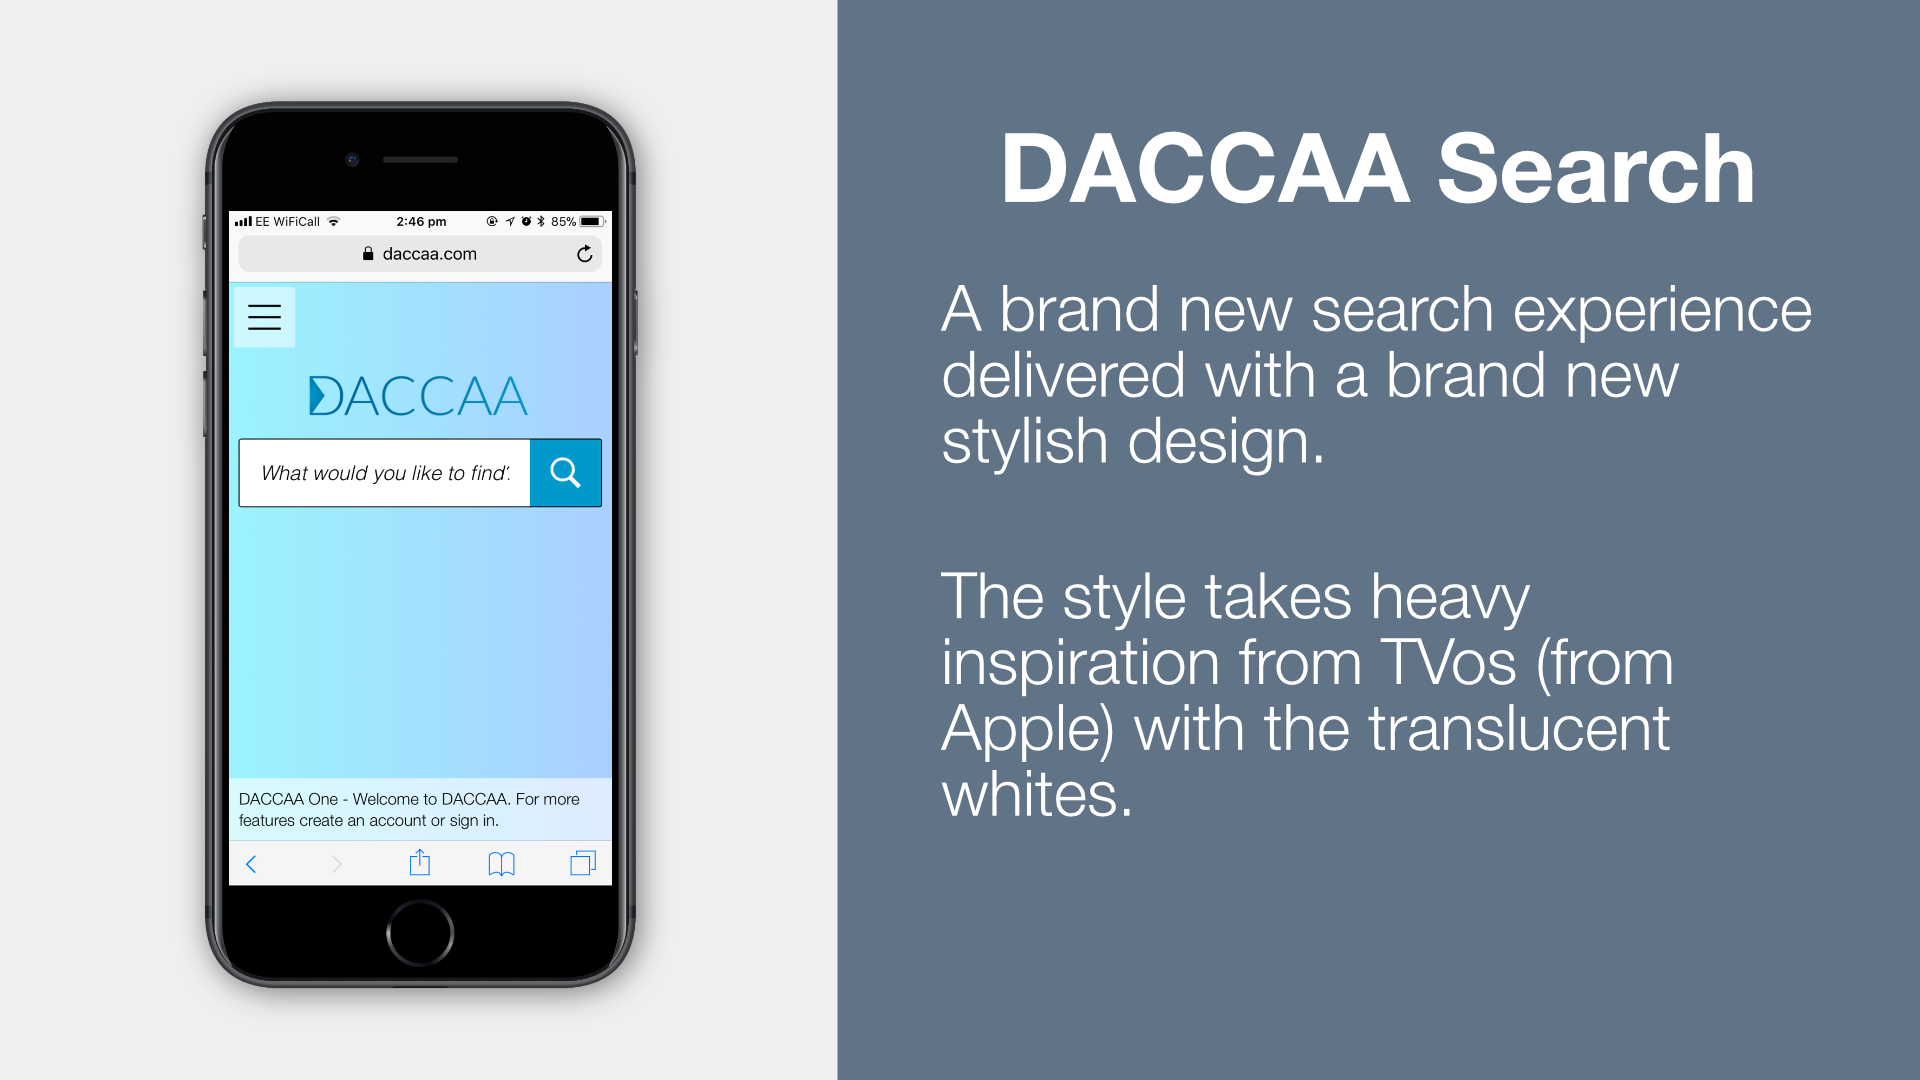 DACCAA Search